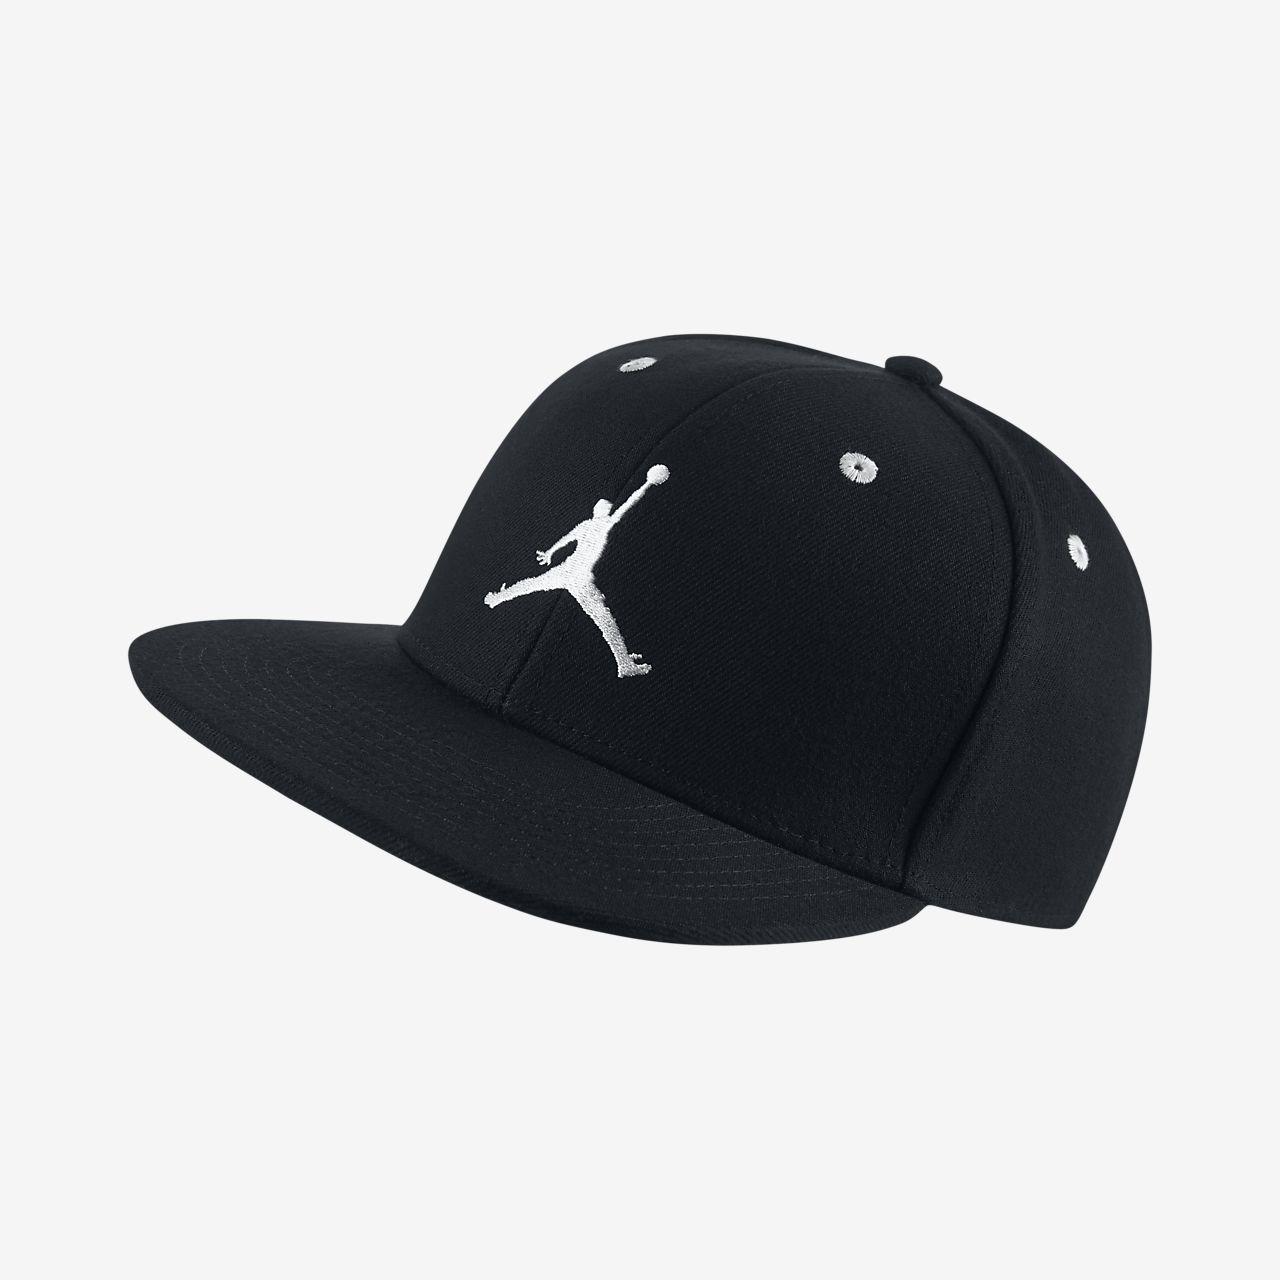 Regulowana czapka dla dzieci Jordan Jumpman